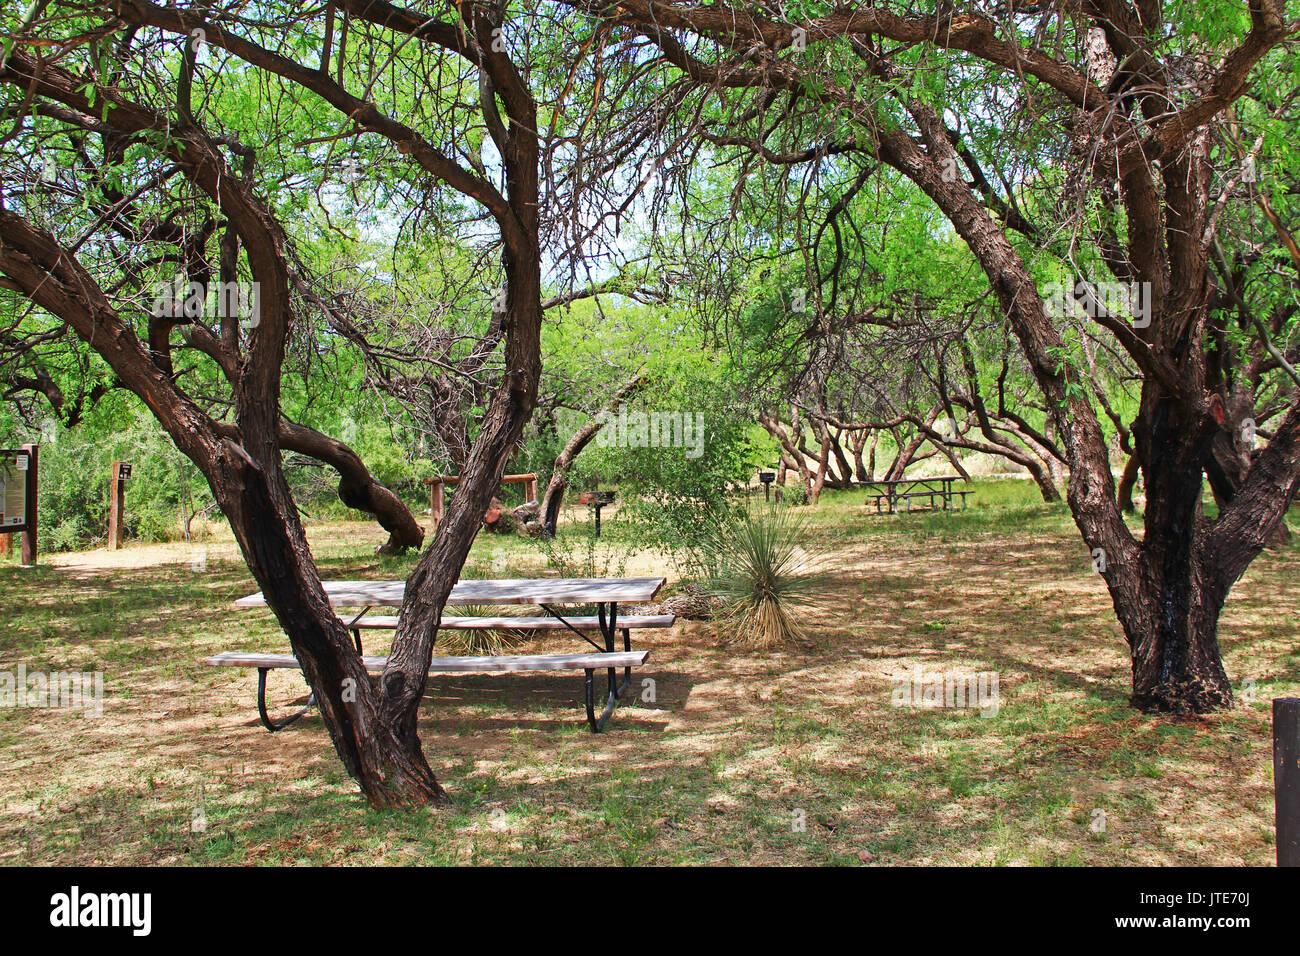 La Posta Quemada Ranch picnic area near the cowboy statue in Colossal Cave Mountain Park in Vail, Arizona, USA near Tucson. - Stock Image